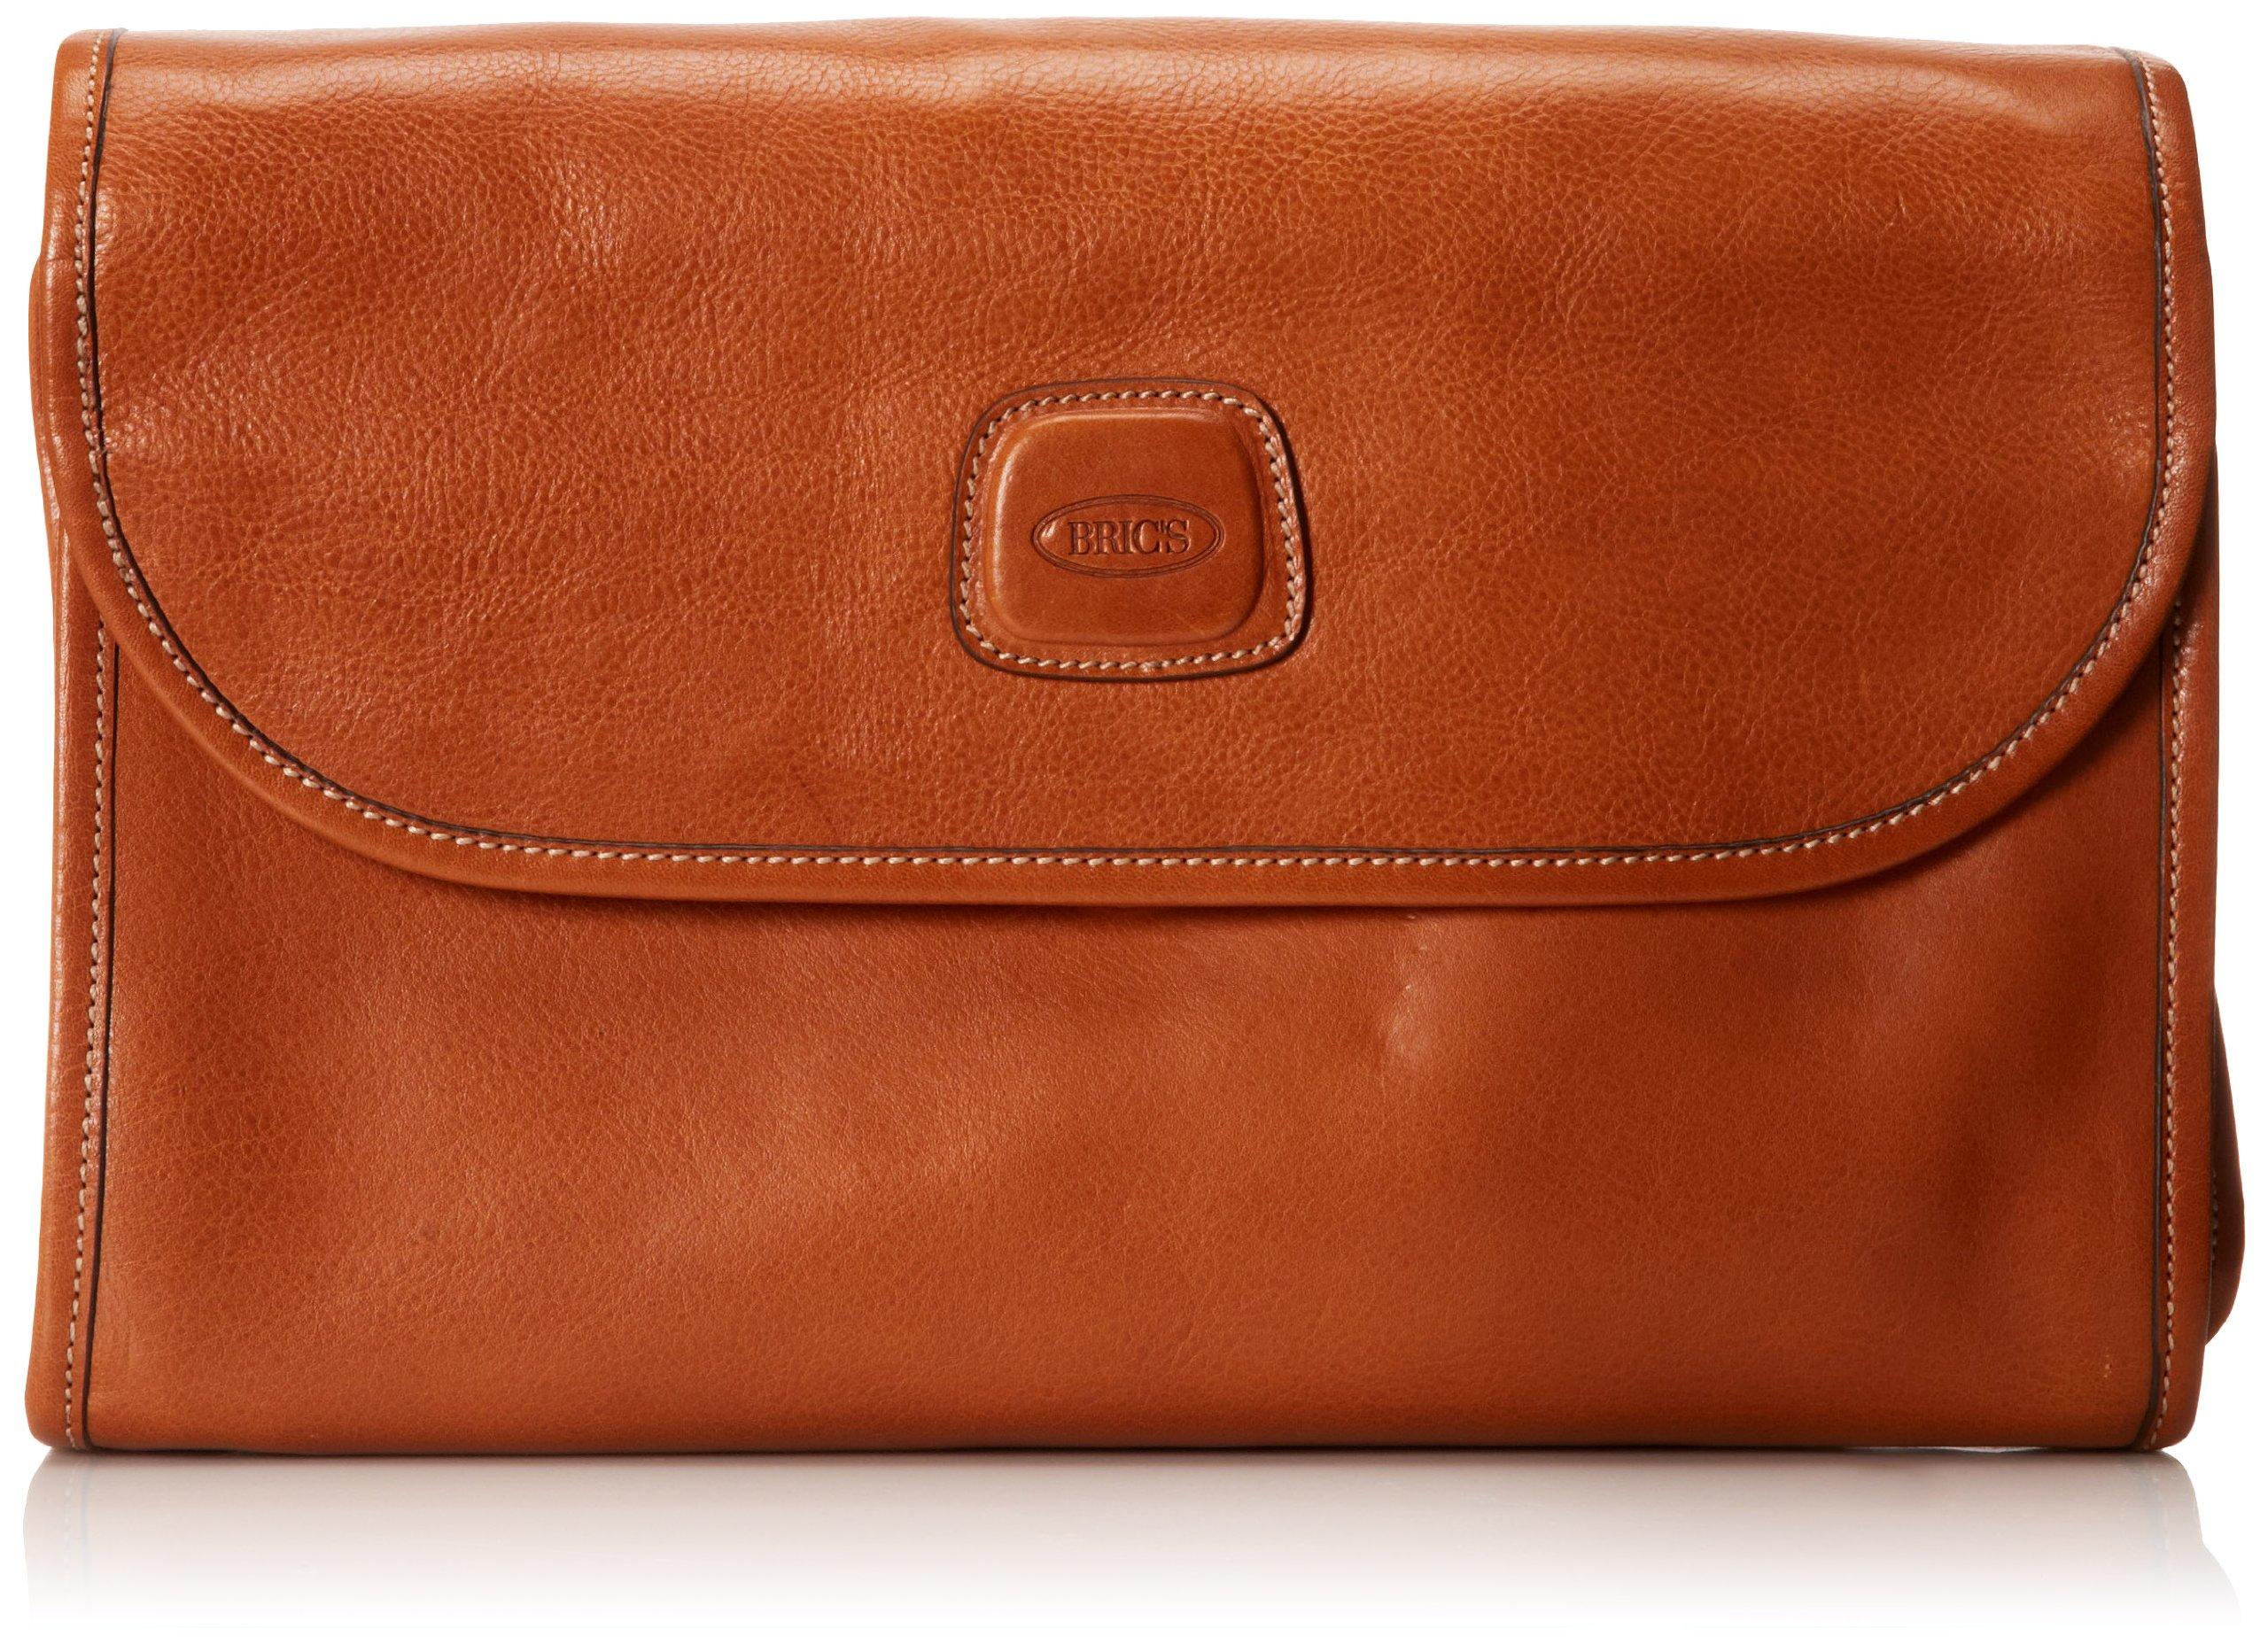 Bric's Luggage Life Pelle Tri-Fold Traveler, Cognac, One Size